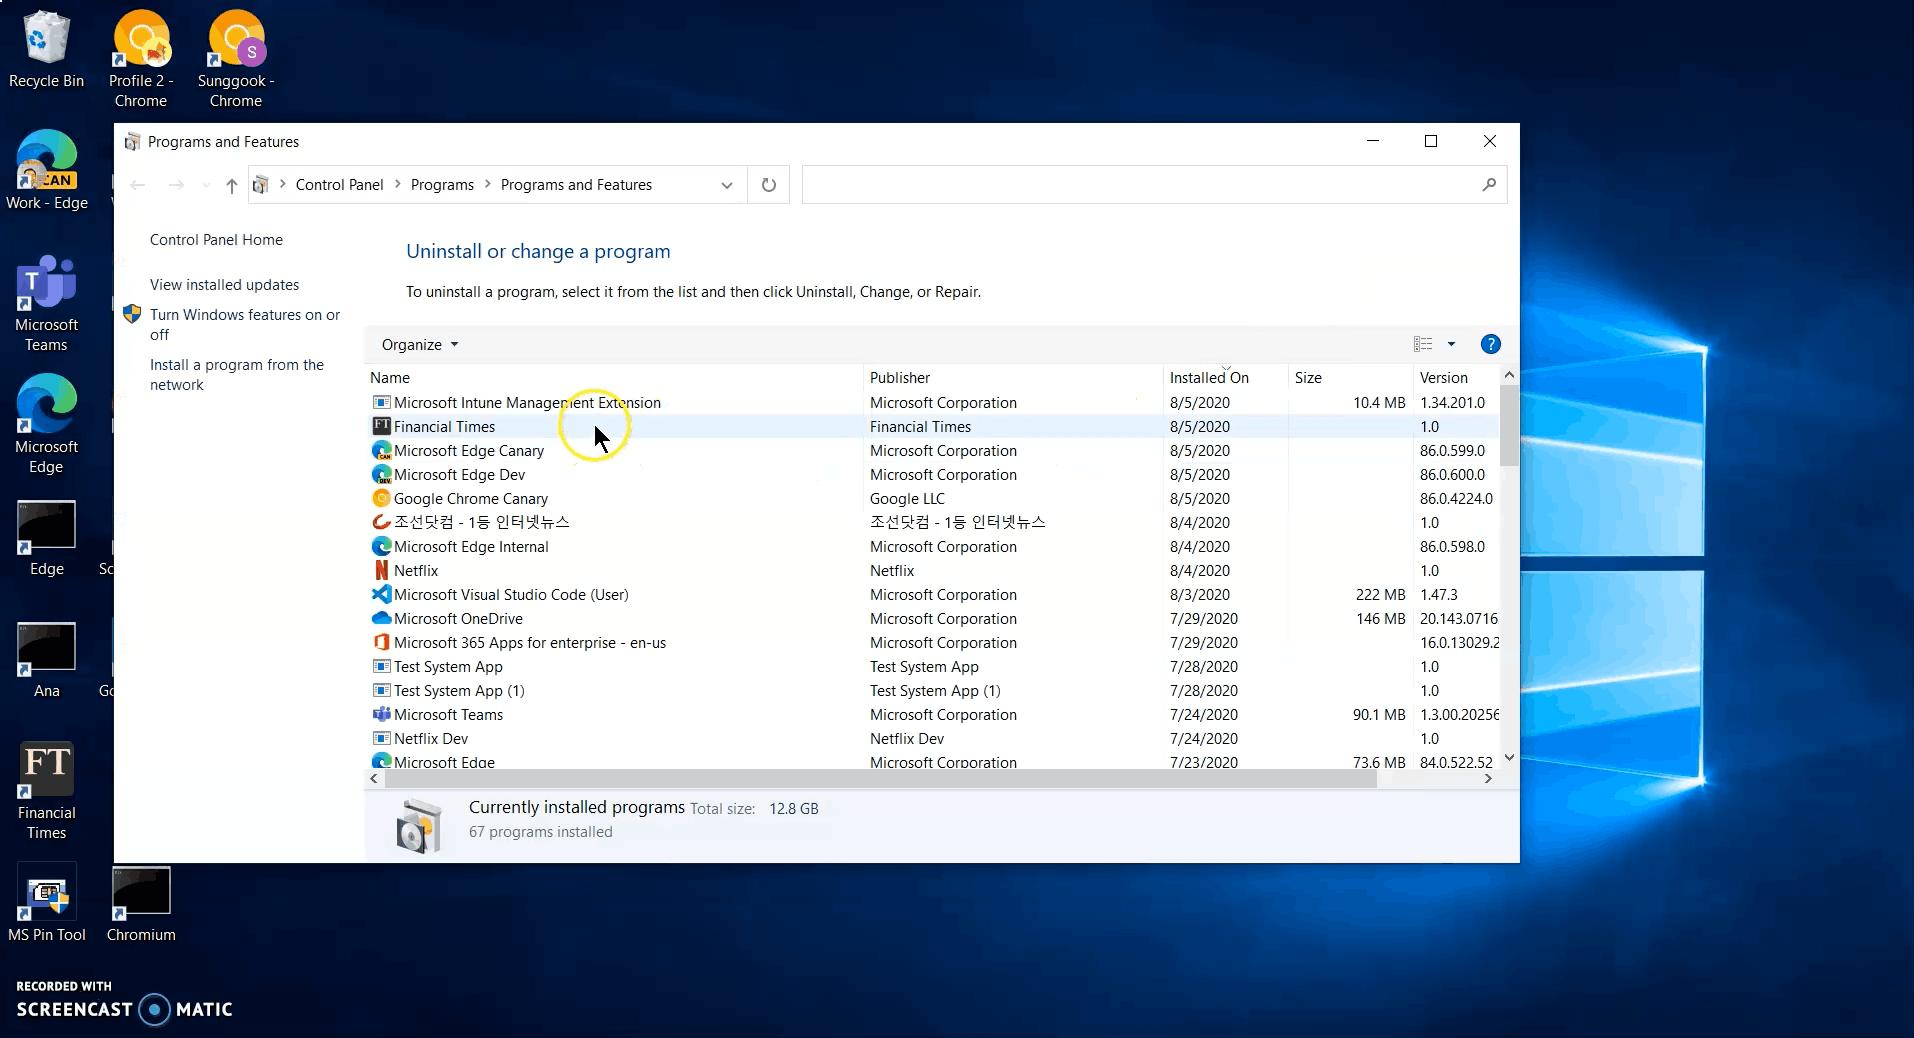 Chrome Uninstall PWA Control Panel 1